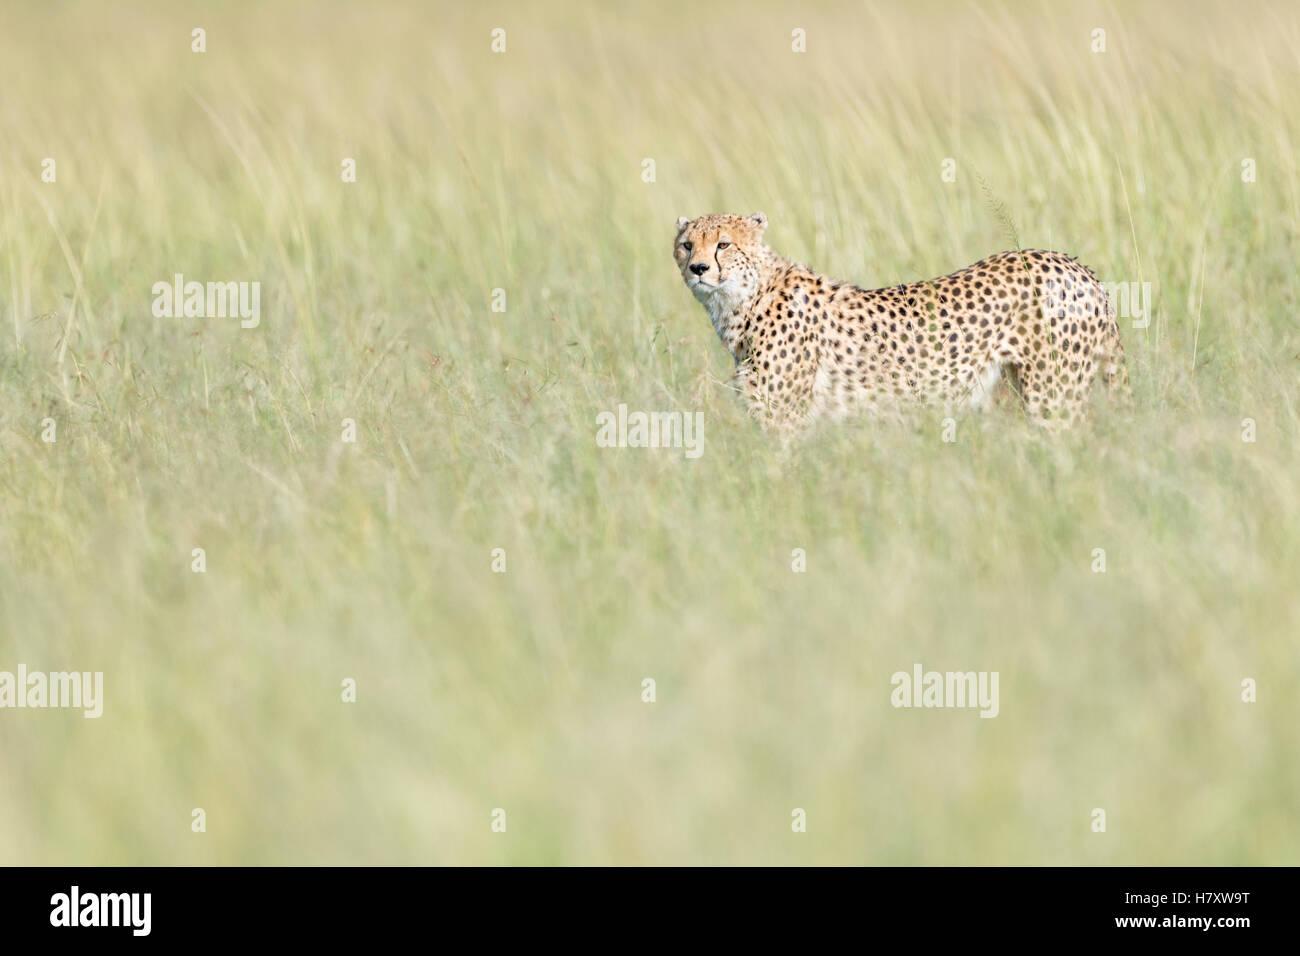 Cheetah (Acinonix jubatus) walking on savanna in high grass, Maasai Mara National Reserve, Kenya - Stock Image